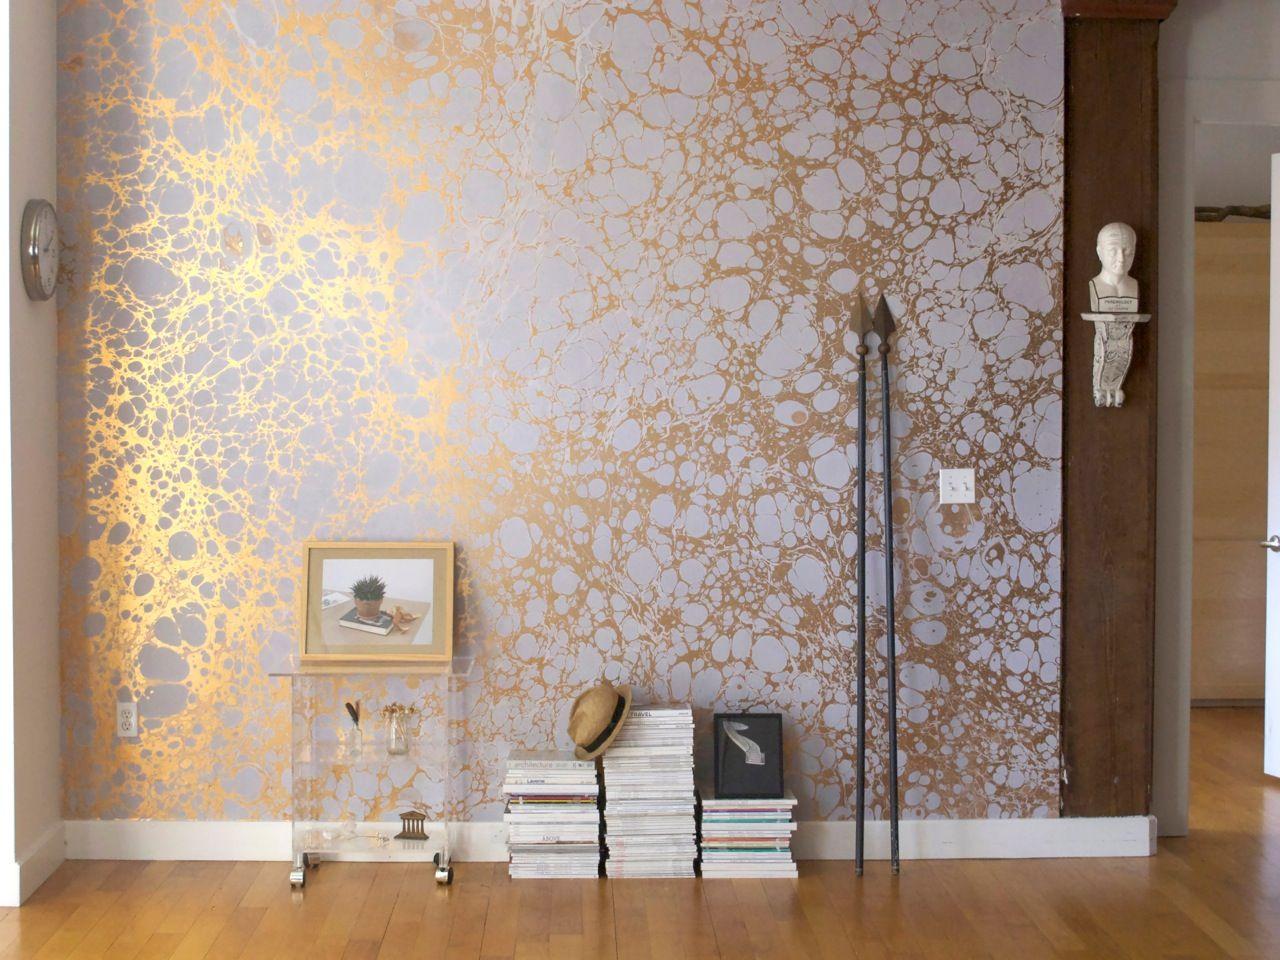 Top Wallpaper Marble Metallic - f2bff4c102b98423289663a48171fda6  Picture_101777.jpg